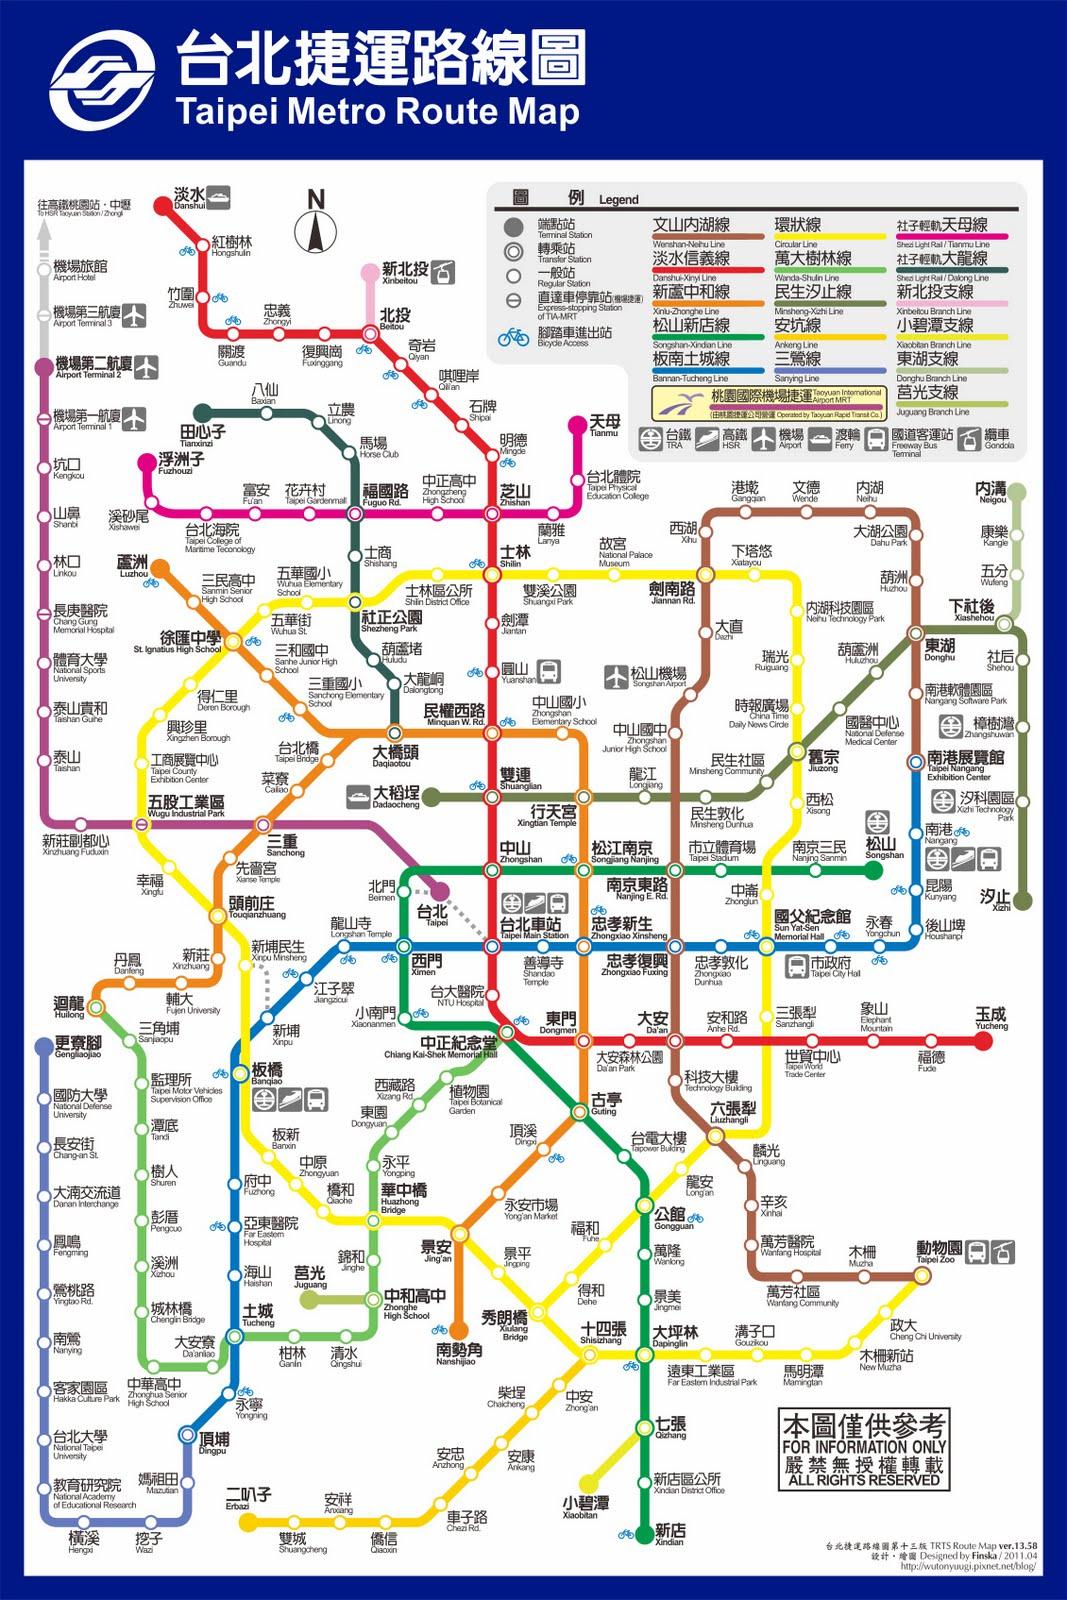 jonesking: 臺北捷運想像圖